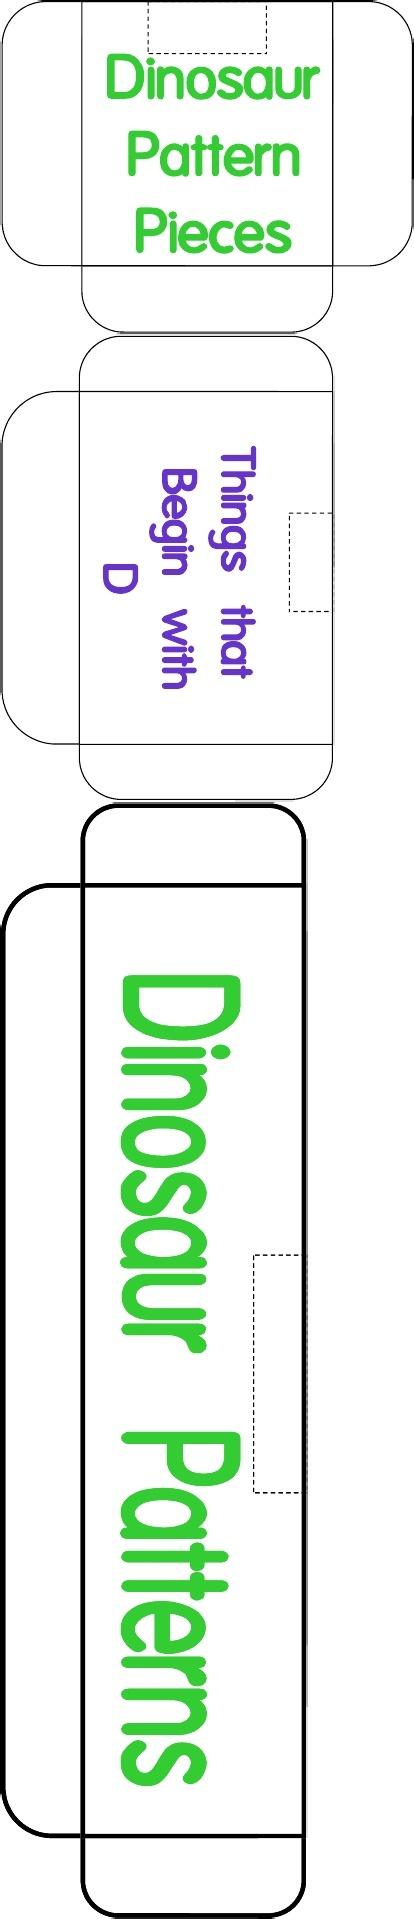 17 best images about dino on pinterest timeline make paper and dino eggs. Black Bedroom Furniture Sets. Home Design Ideas